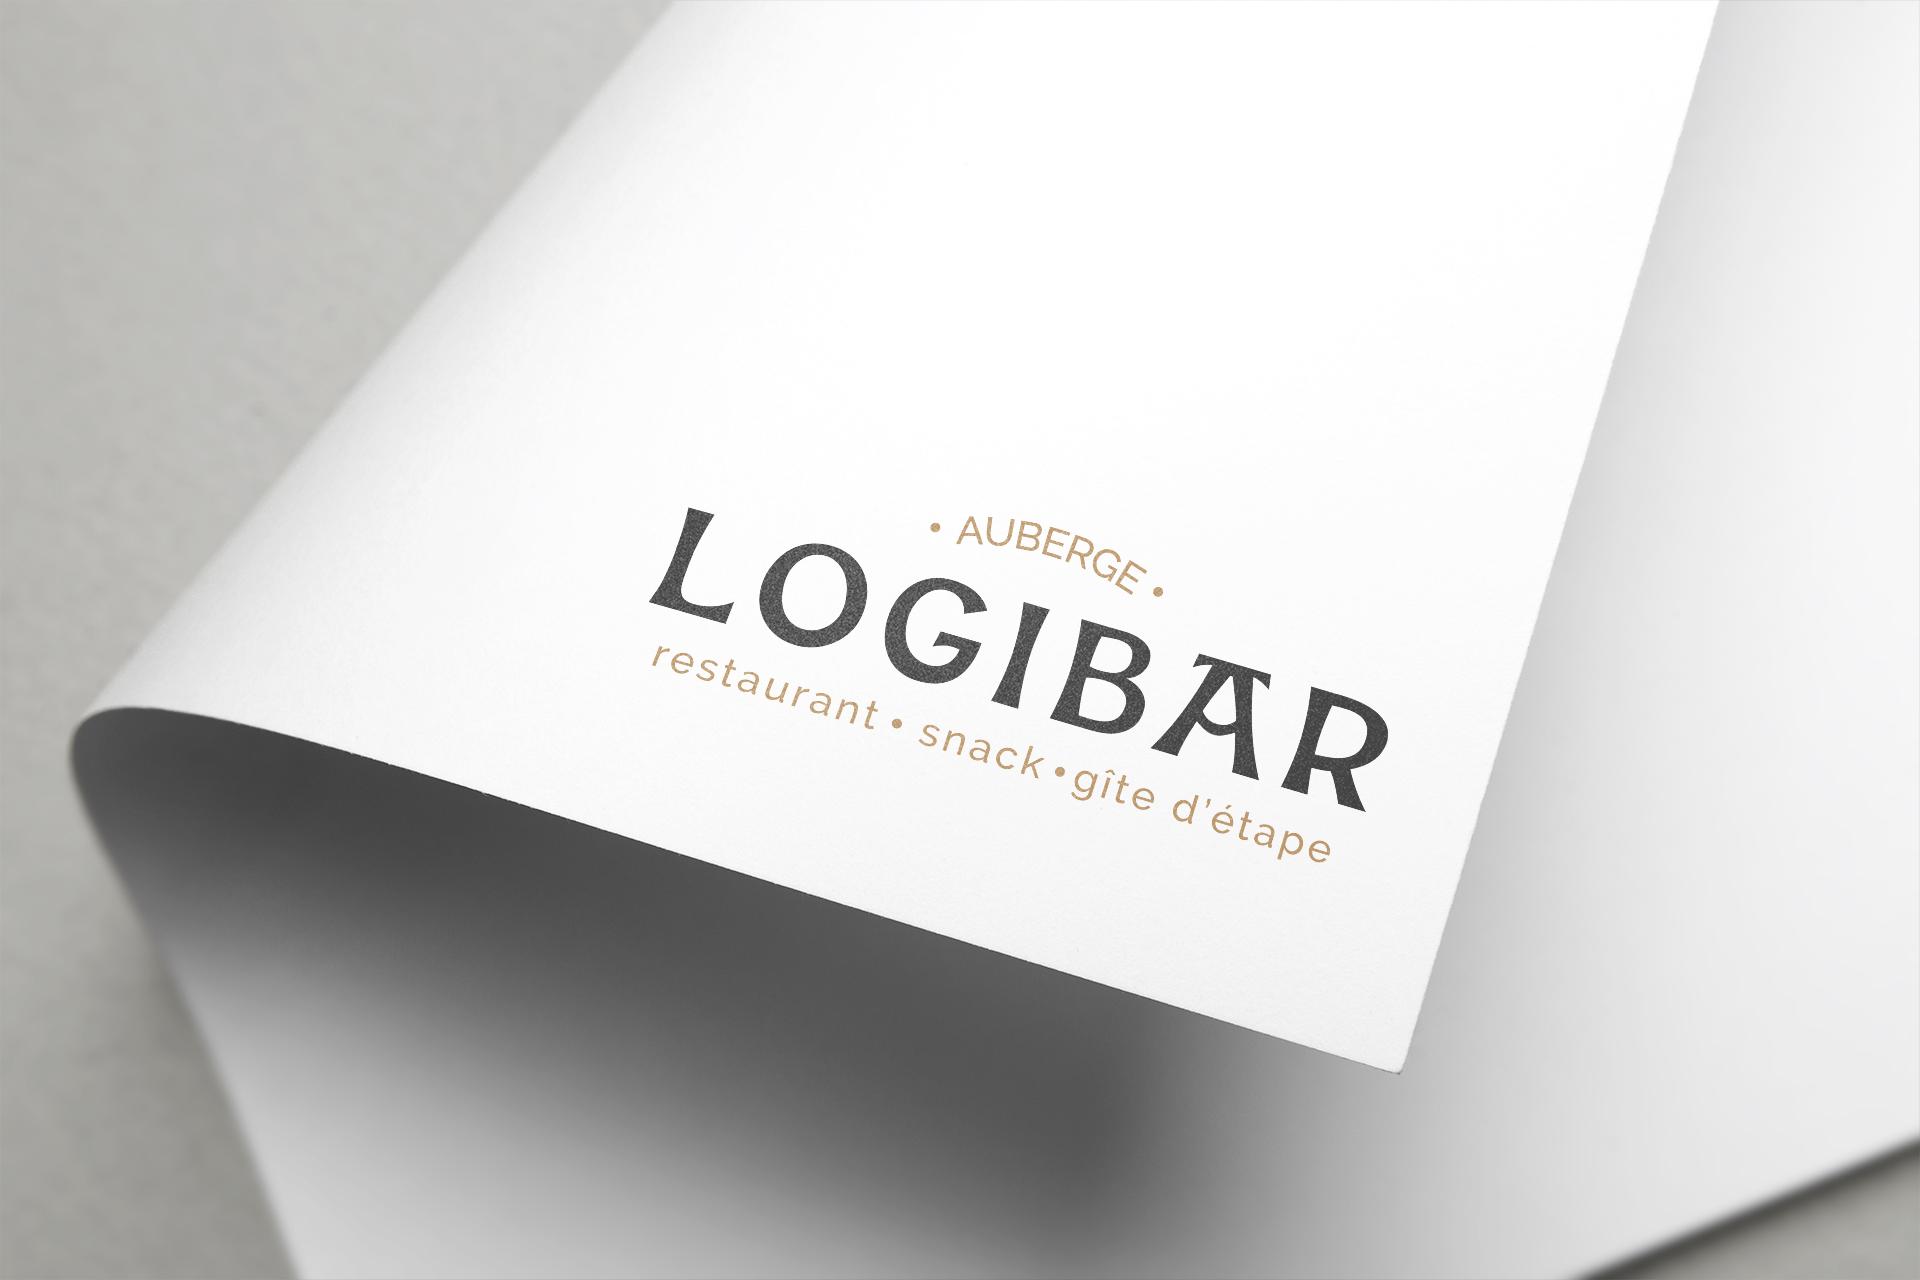 Logo Auberge Logibar à Larrau